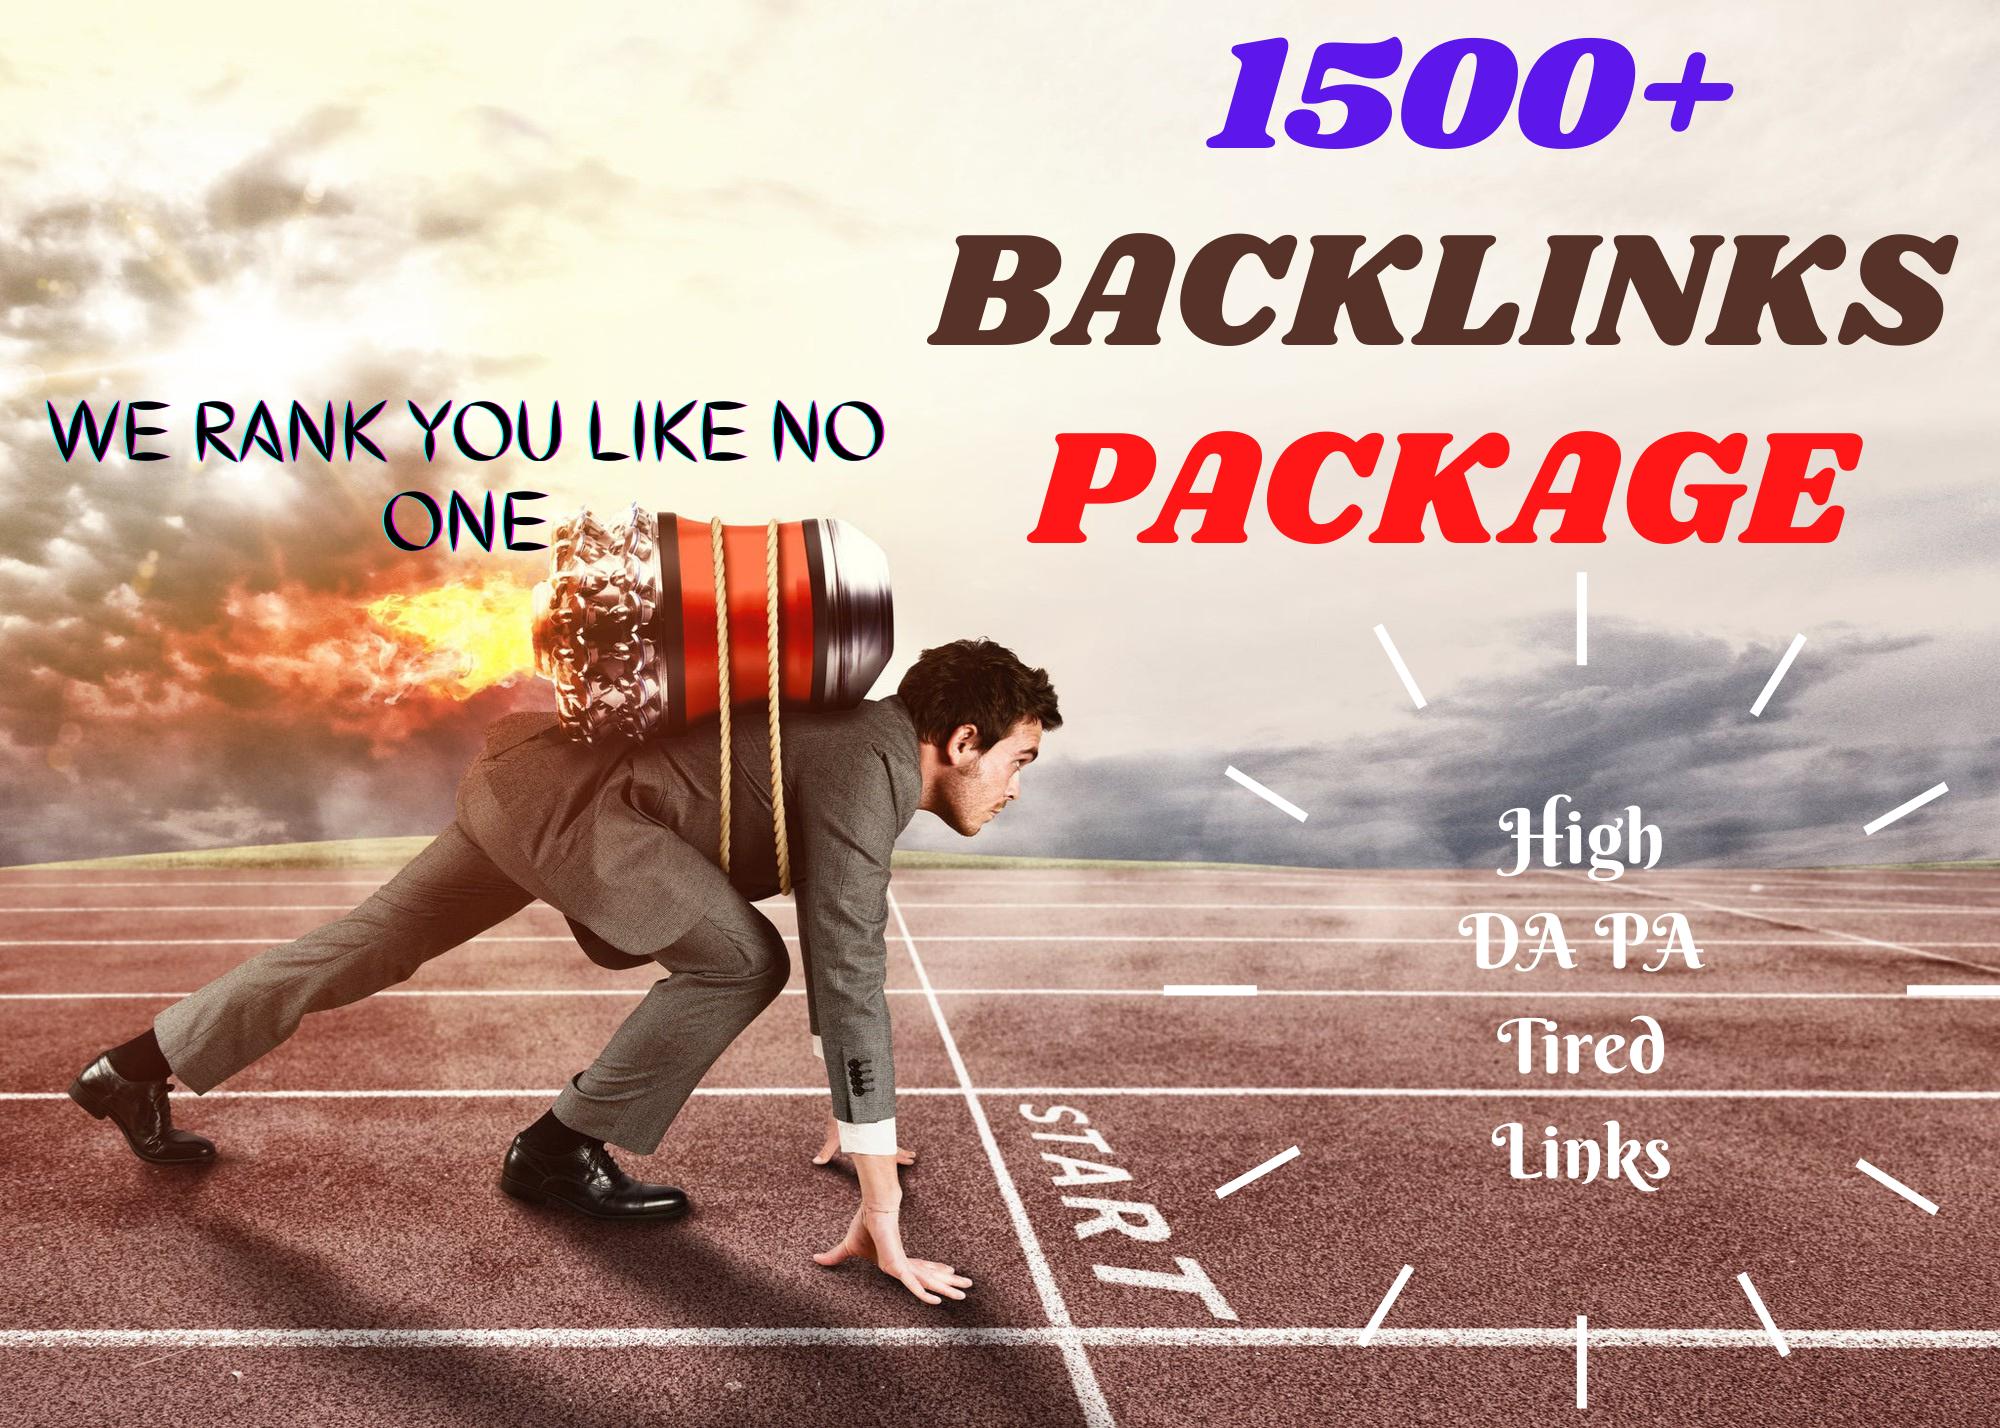 1500 High DA PA Tired LInk Backlinks to Skyrocket Your Ranking On Google